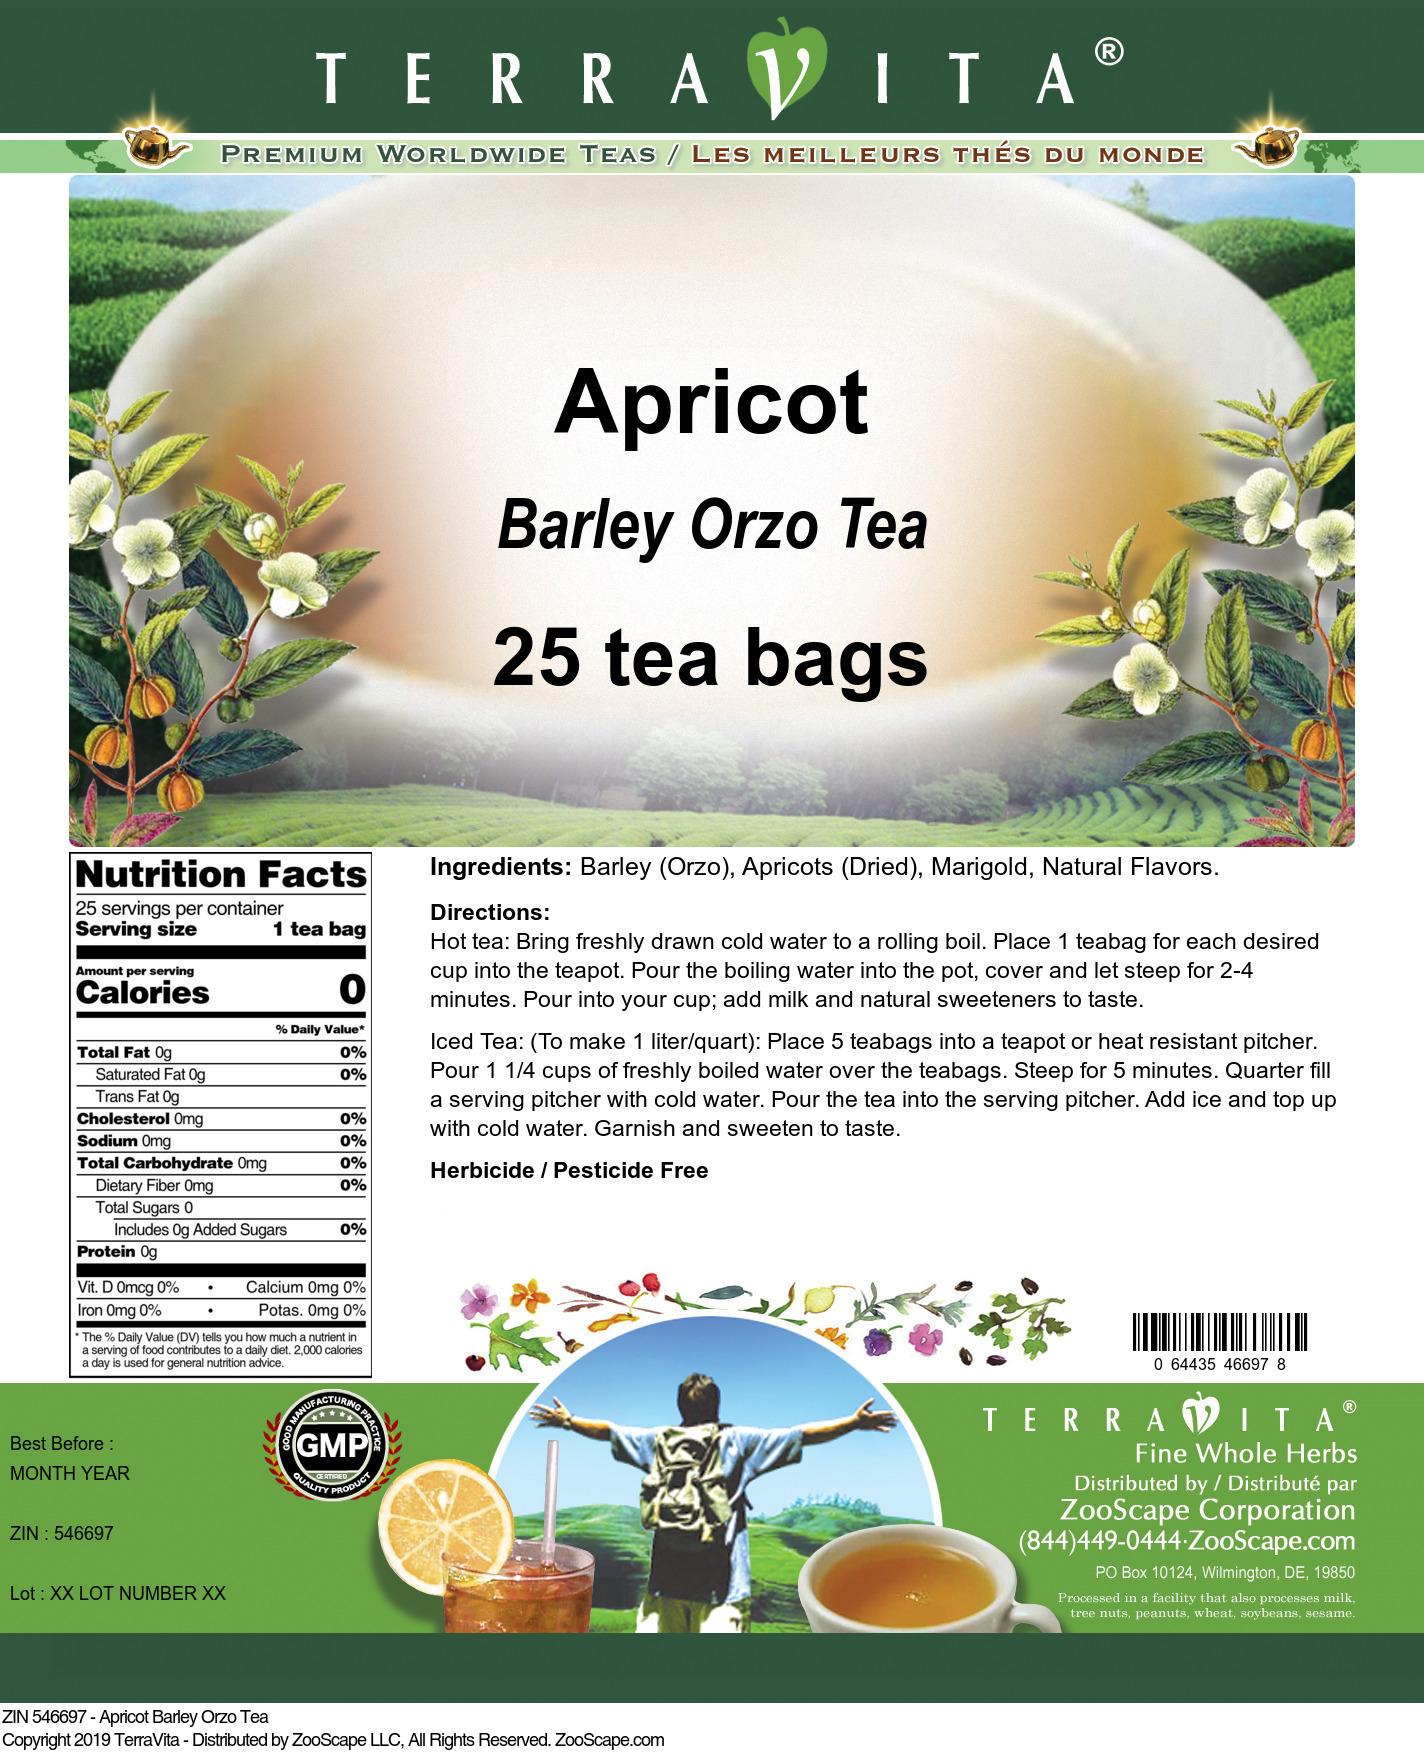 Apricot Barley Orzo